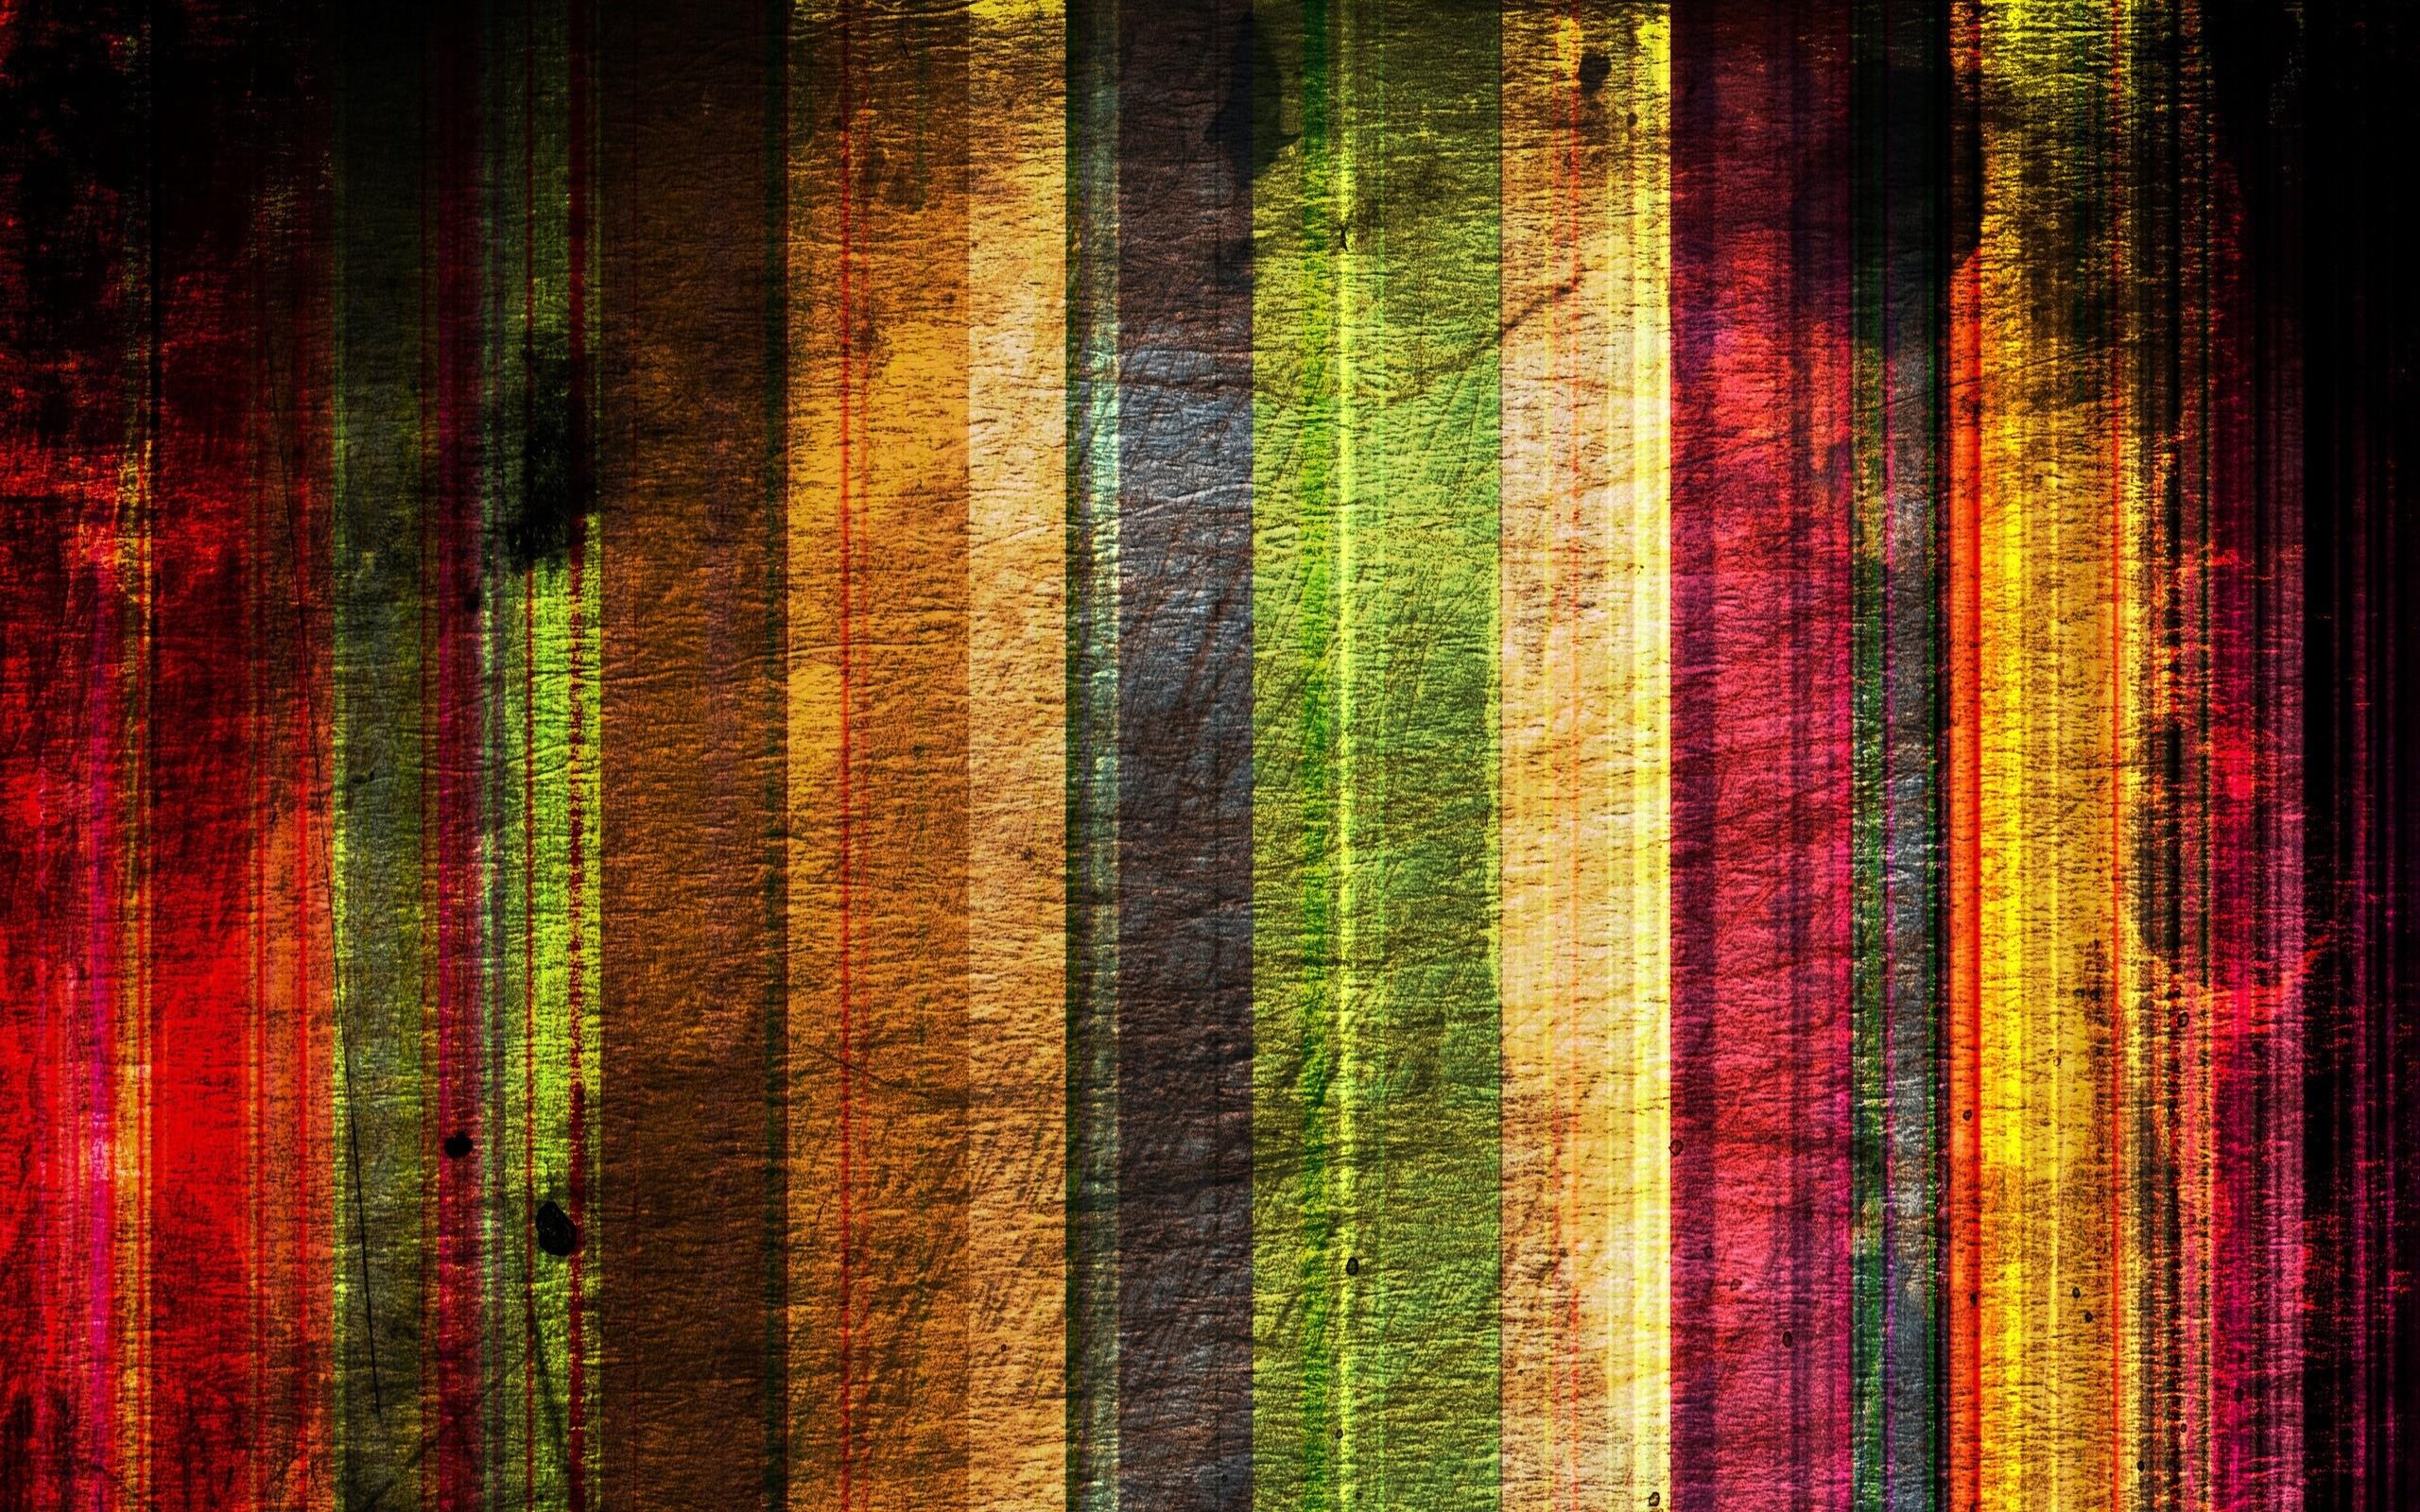 Wallpaper Eishockey Hd Wallpaper: Backgrounds - Wallpaper Abyss